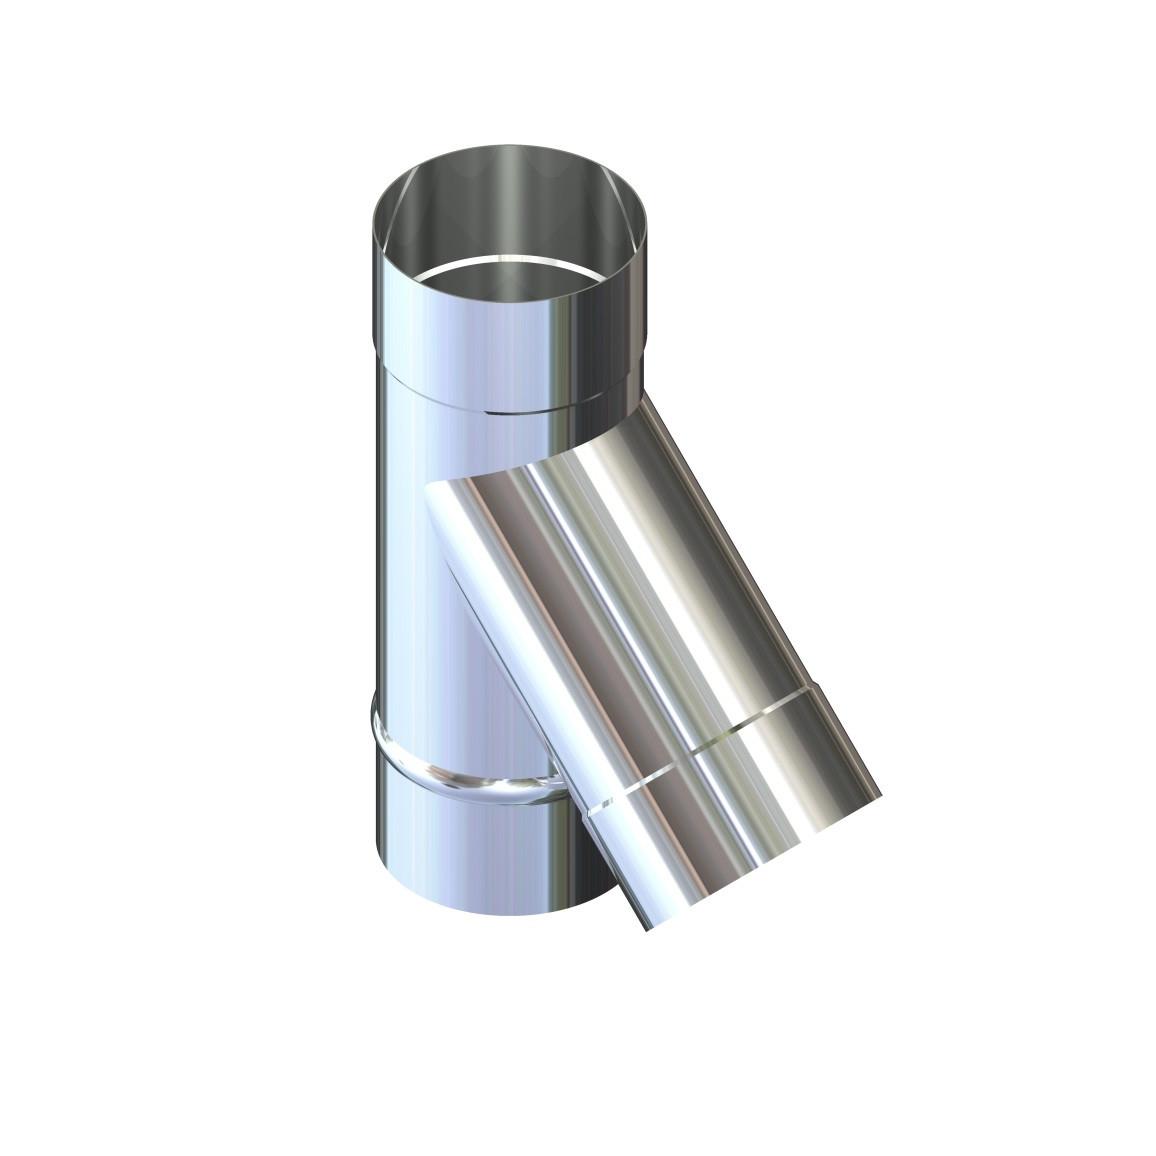 Тройник 45° для дымохода D-180 мм толщина 1 мм